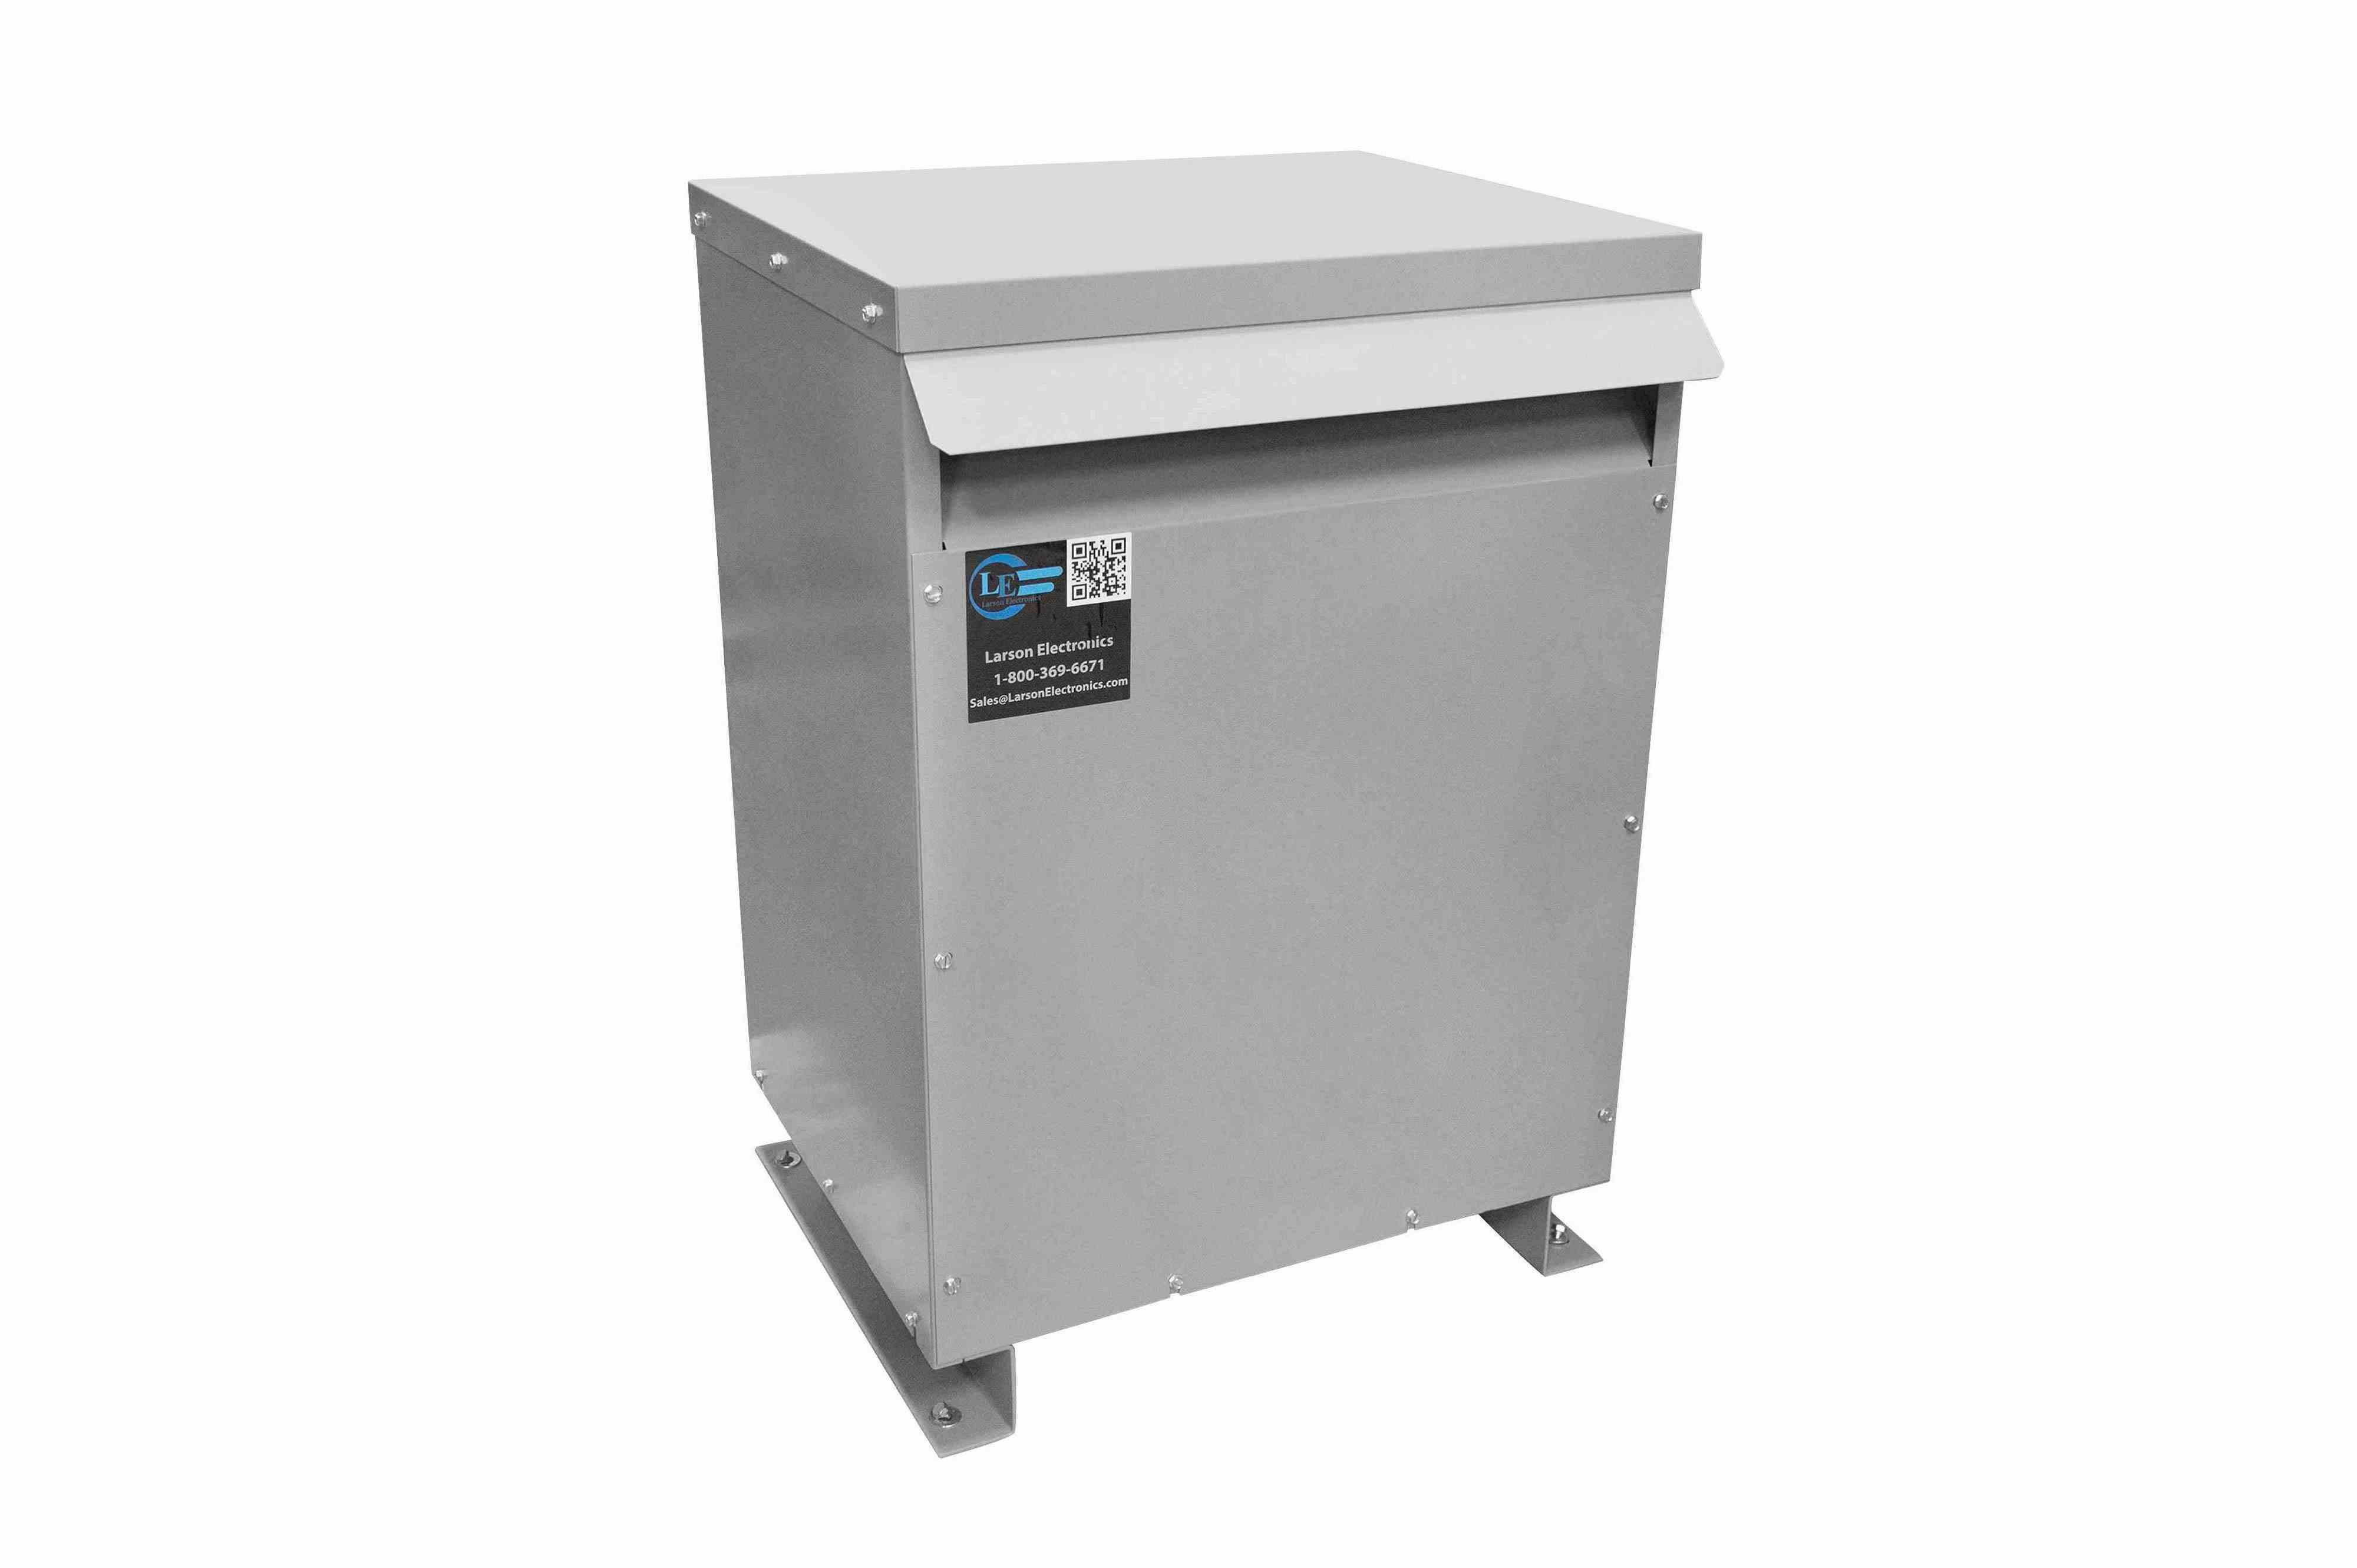 75 kVA 1PH DOE Efficiency Transformer, 208V Primary, 480V Secondary, NEMA 3R, Ventilated, 60 Hz